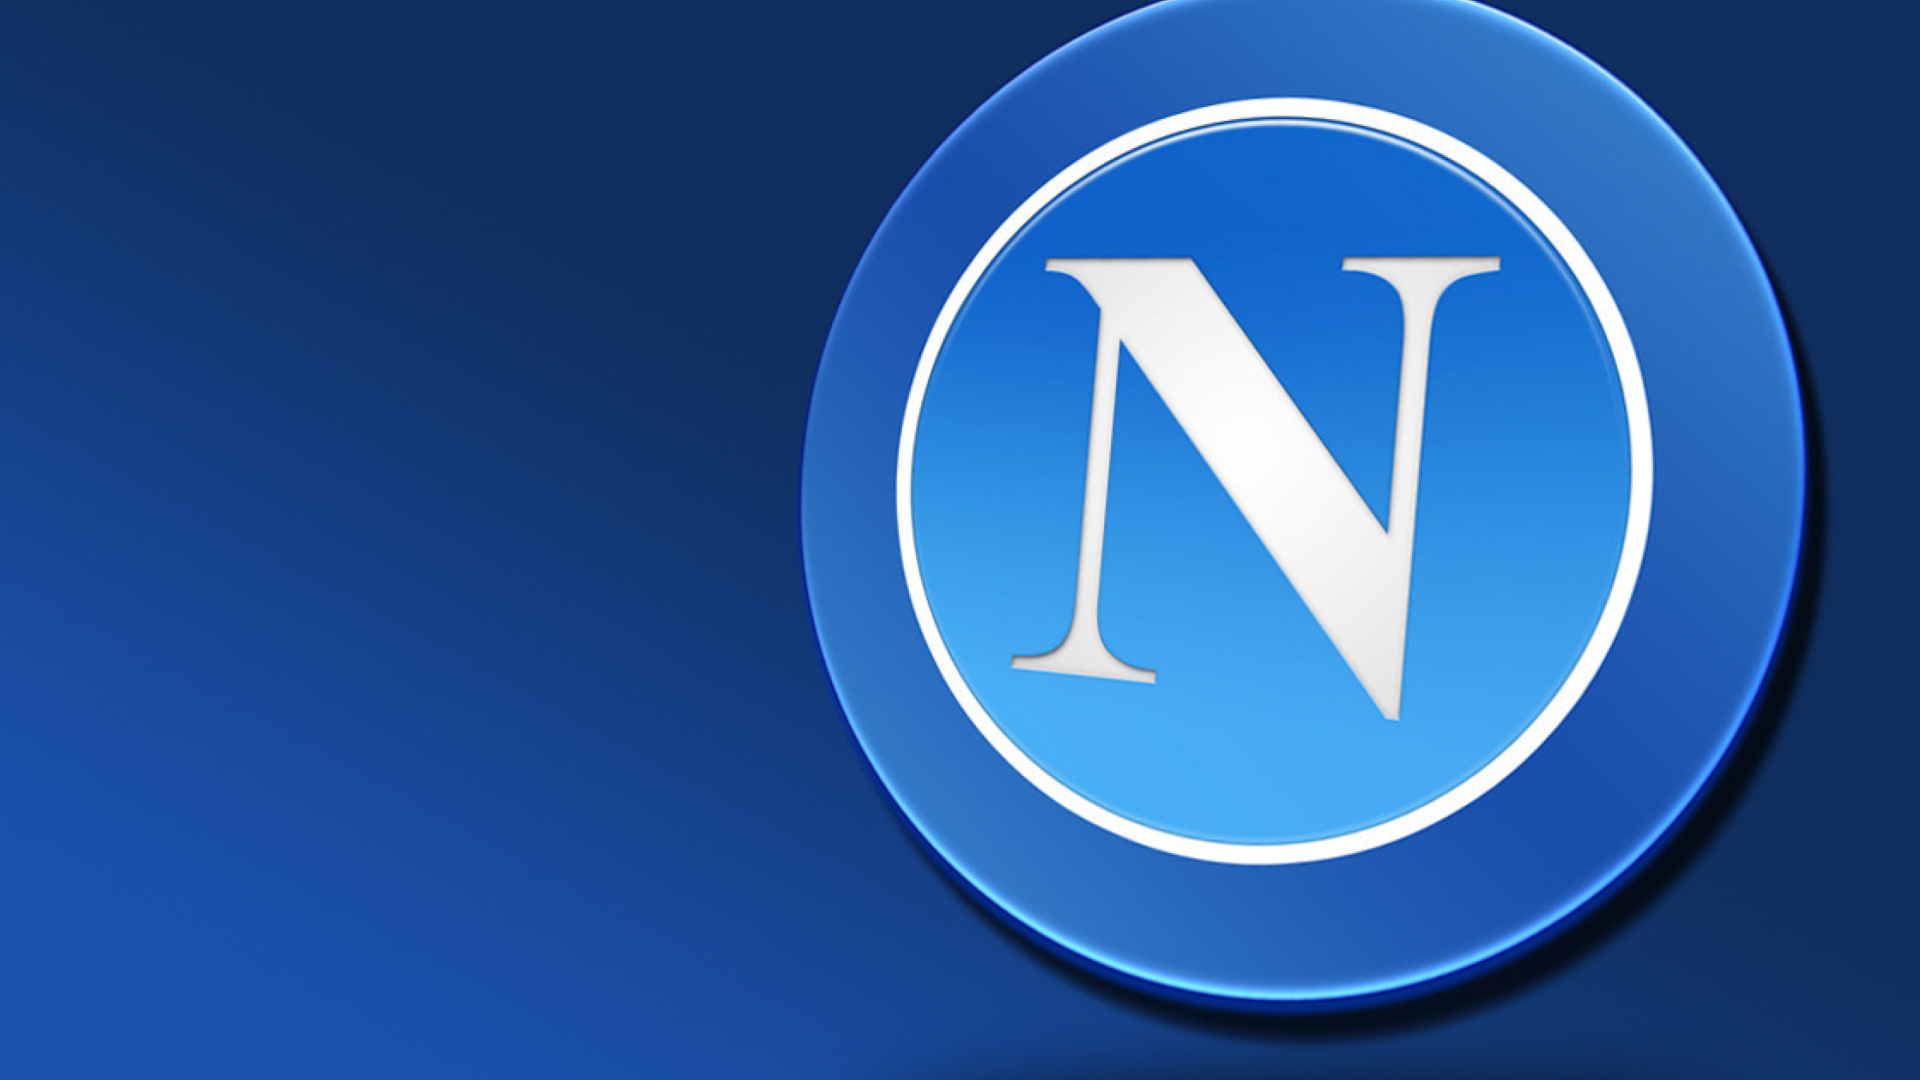 Napoli sfondi gratuiti per desktop 1920x1080 full hd for Immagini full hd 1920x1080